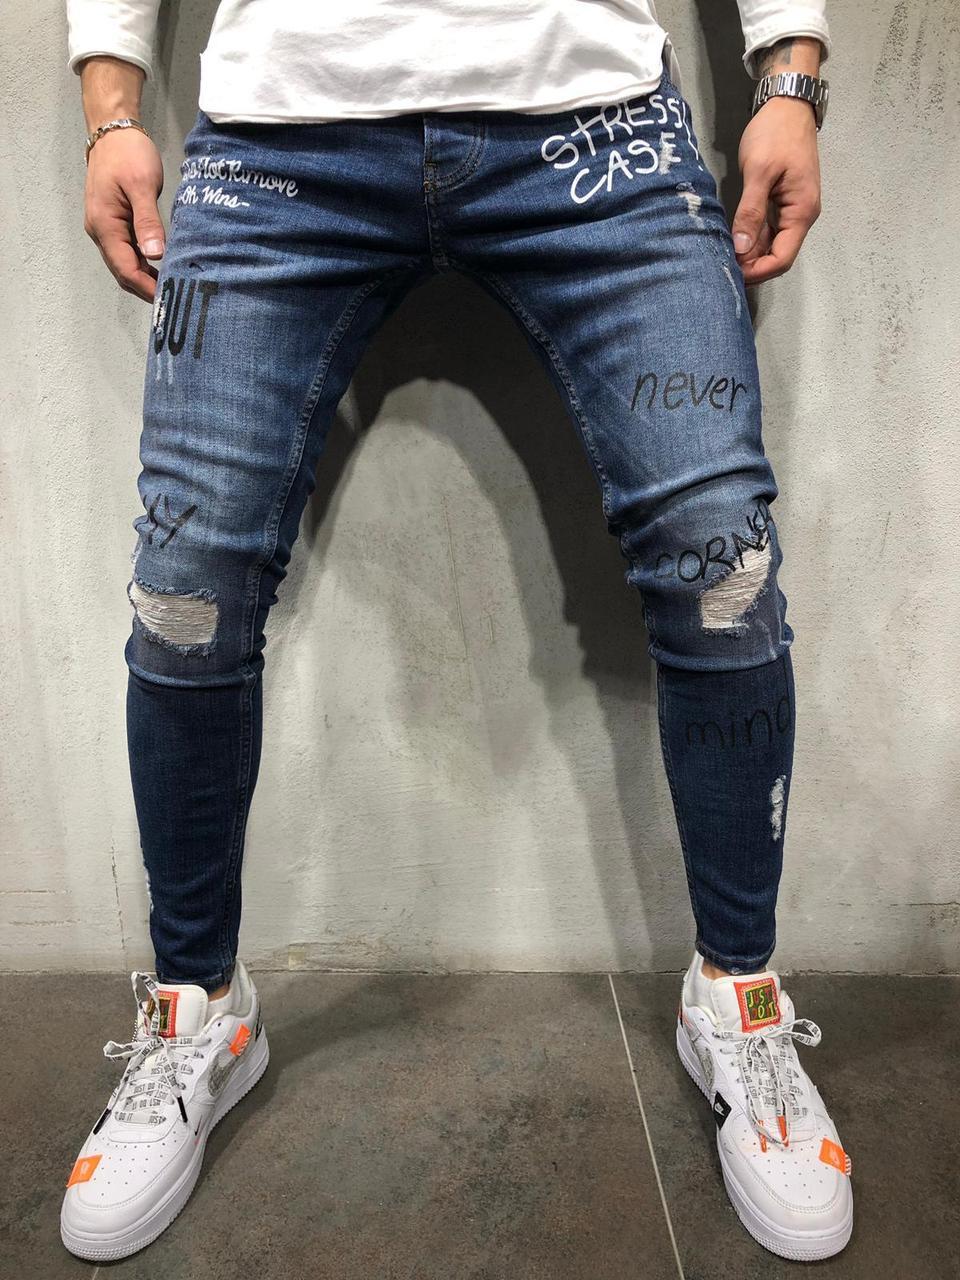 9c3f323880f Мужские синие джинсы с потертостями на коленях (рваные джинсы) синие  зауженные - Krossovki в